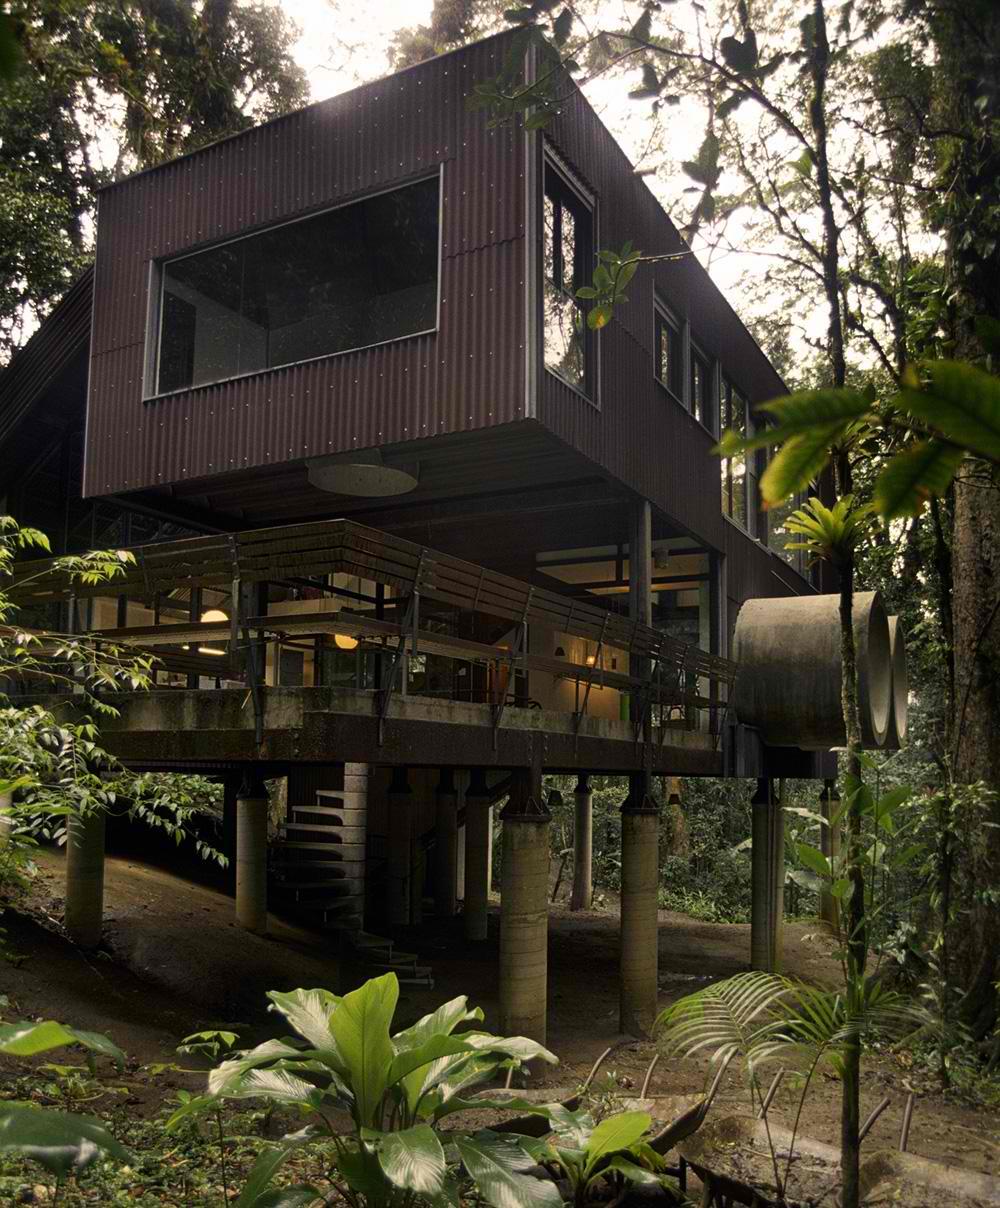 Beach Home Decor: Beach House In Brazil By ArqDonini